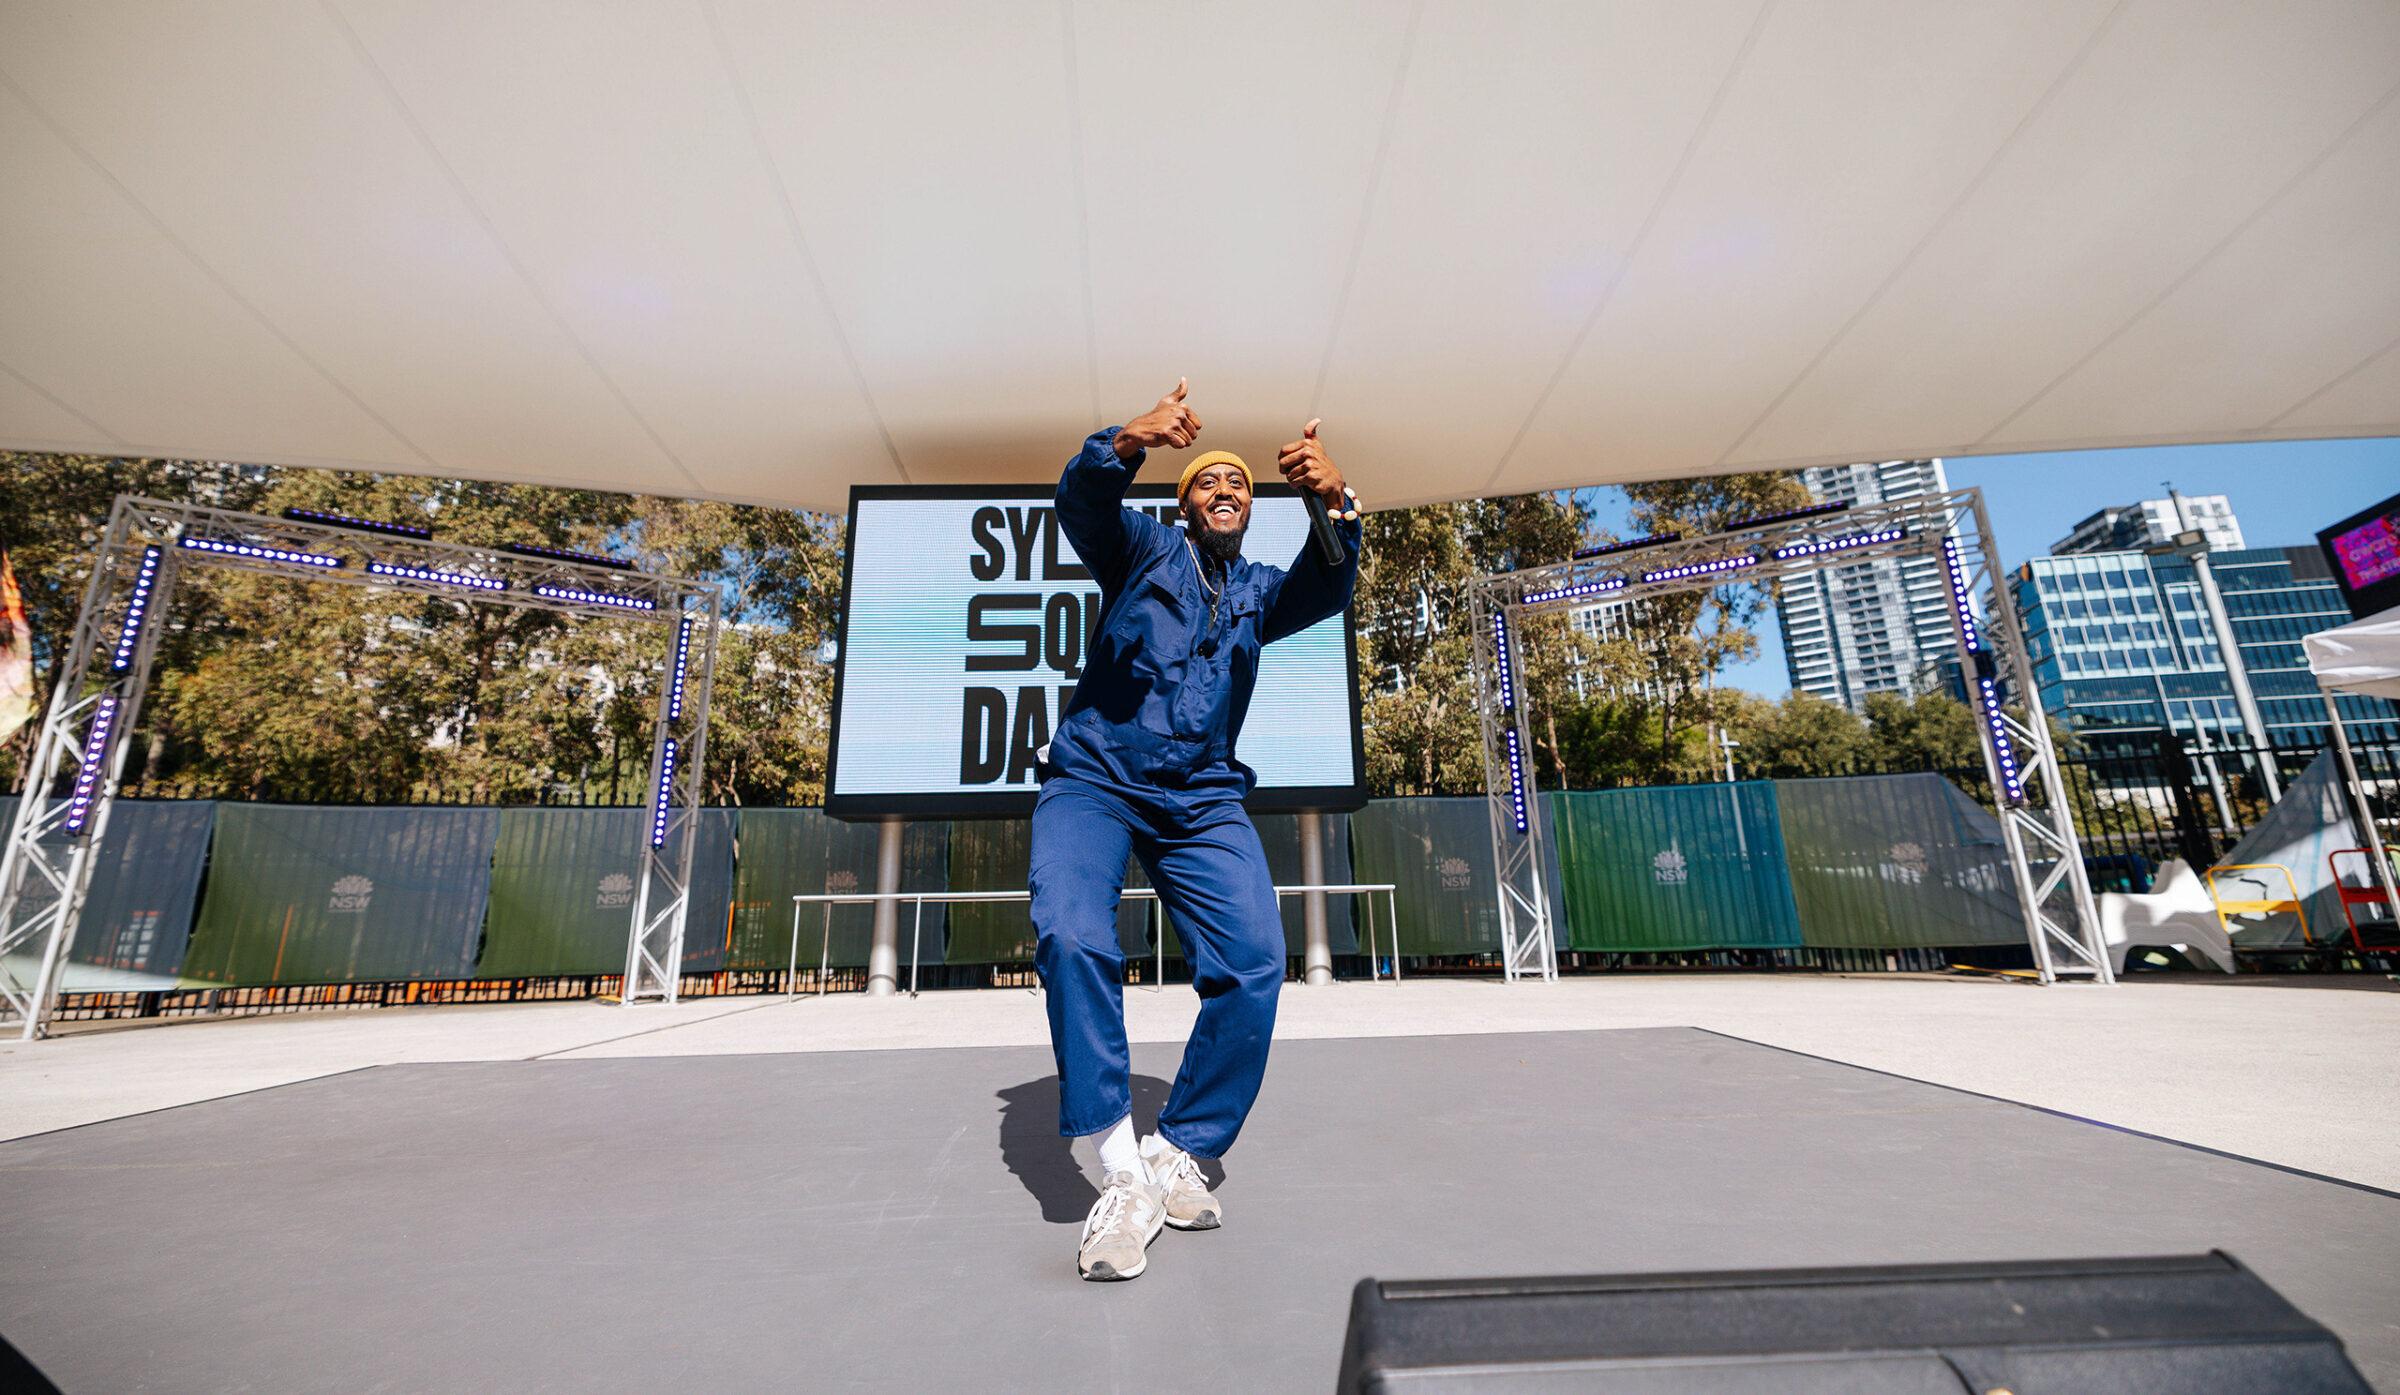 Sydney Square Dance